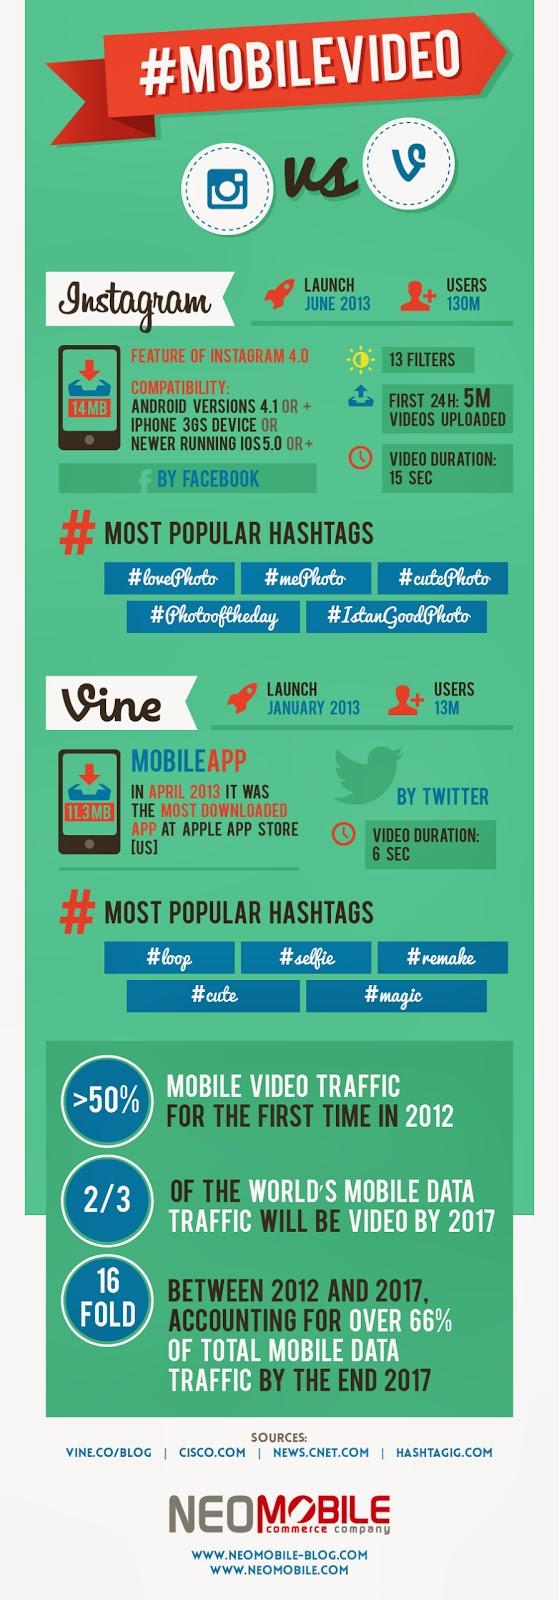 Instagram vs Vine Faceoff